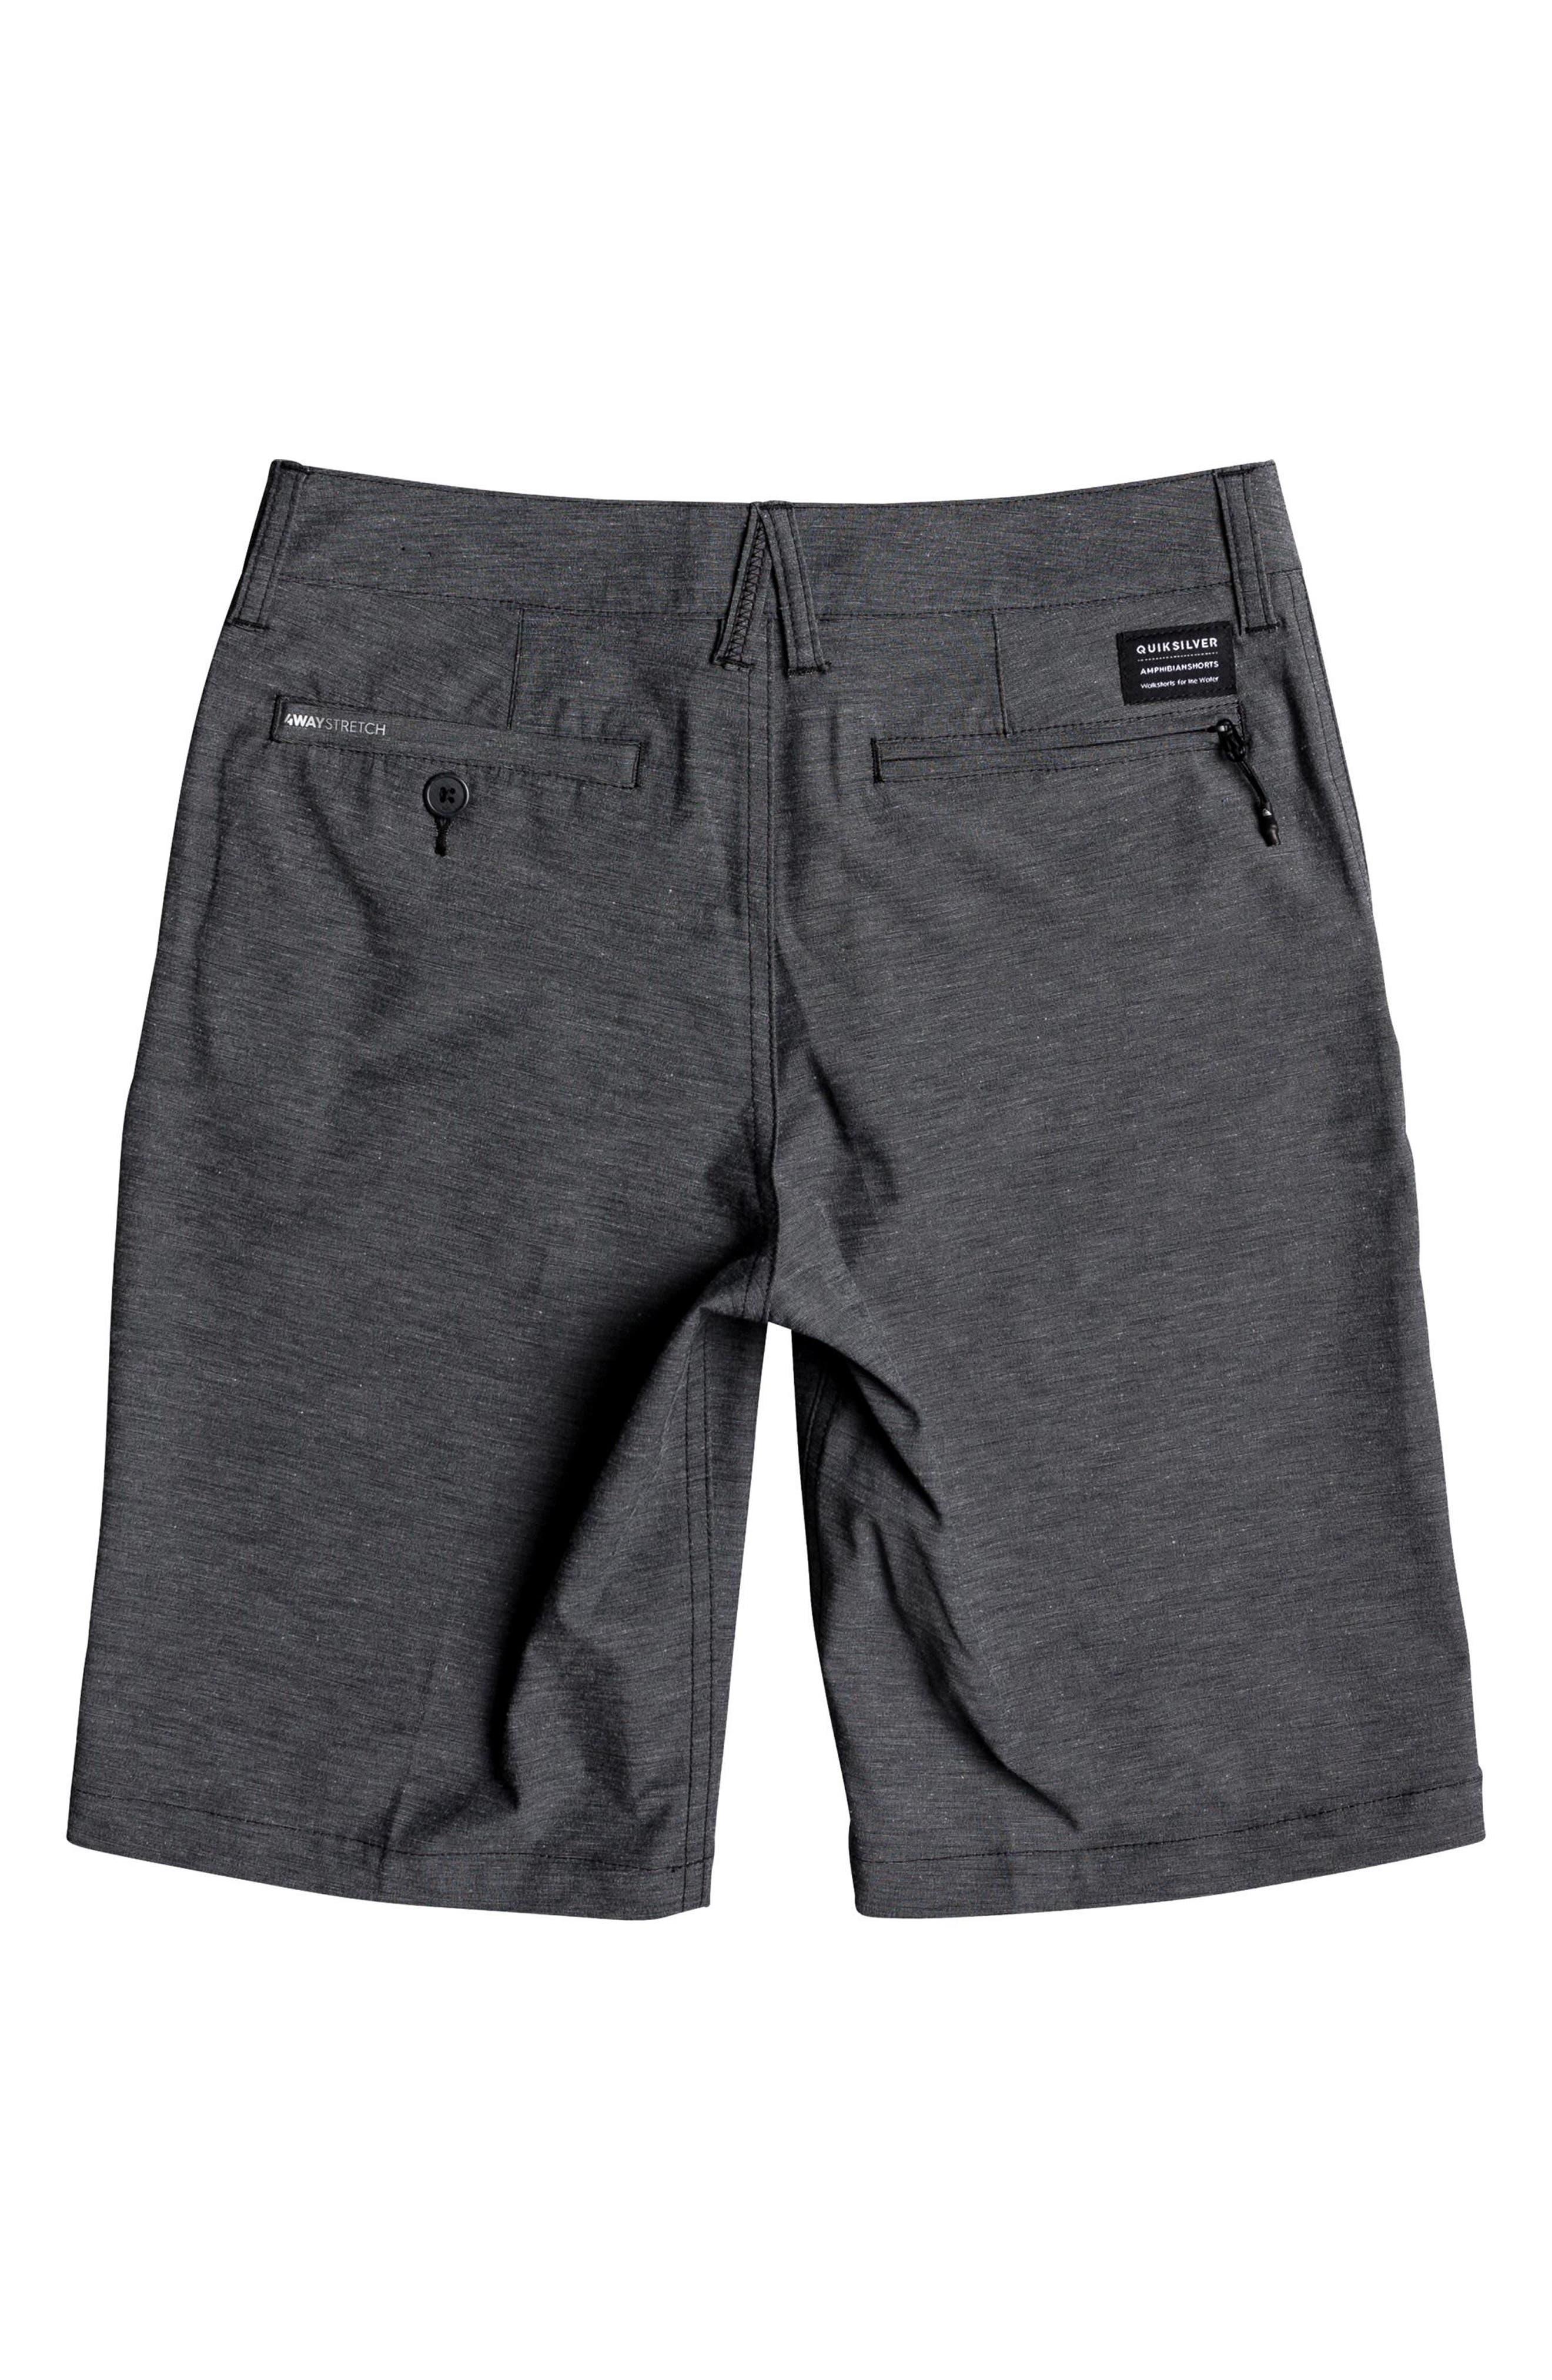 Union Heather Amphibian Hybrid Shorts,                             Alternate thumbnail 2, color,                             BLACK